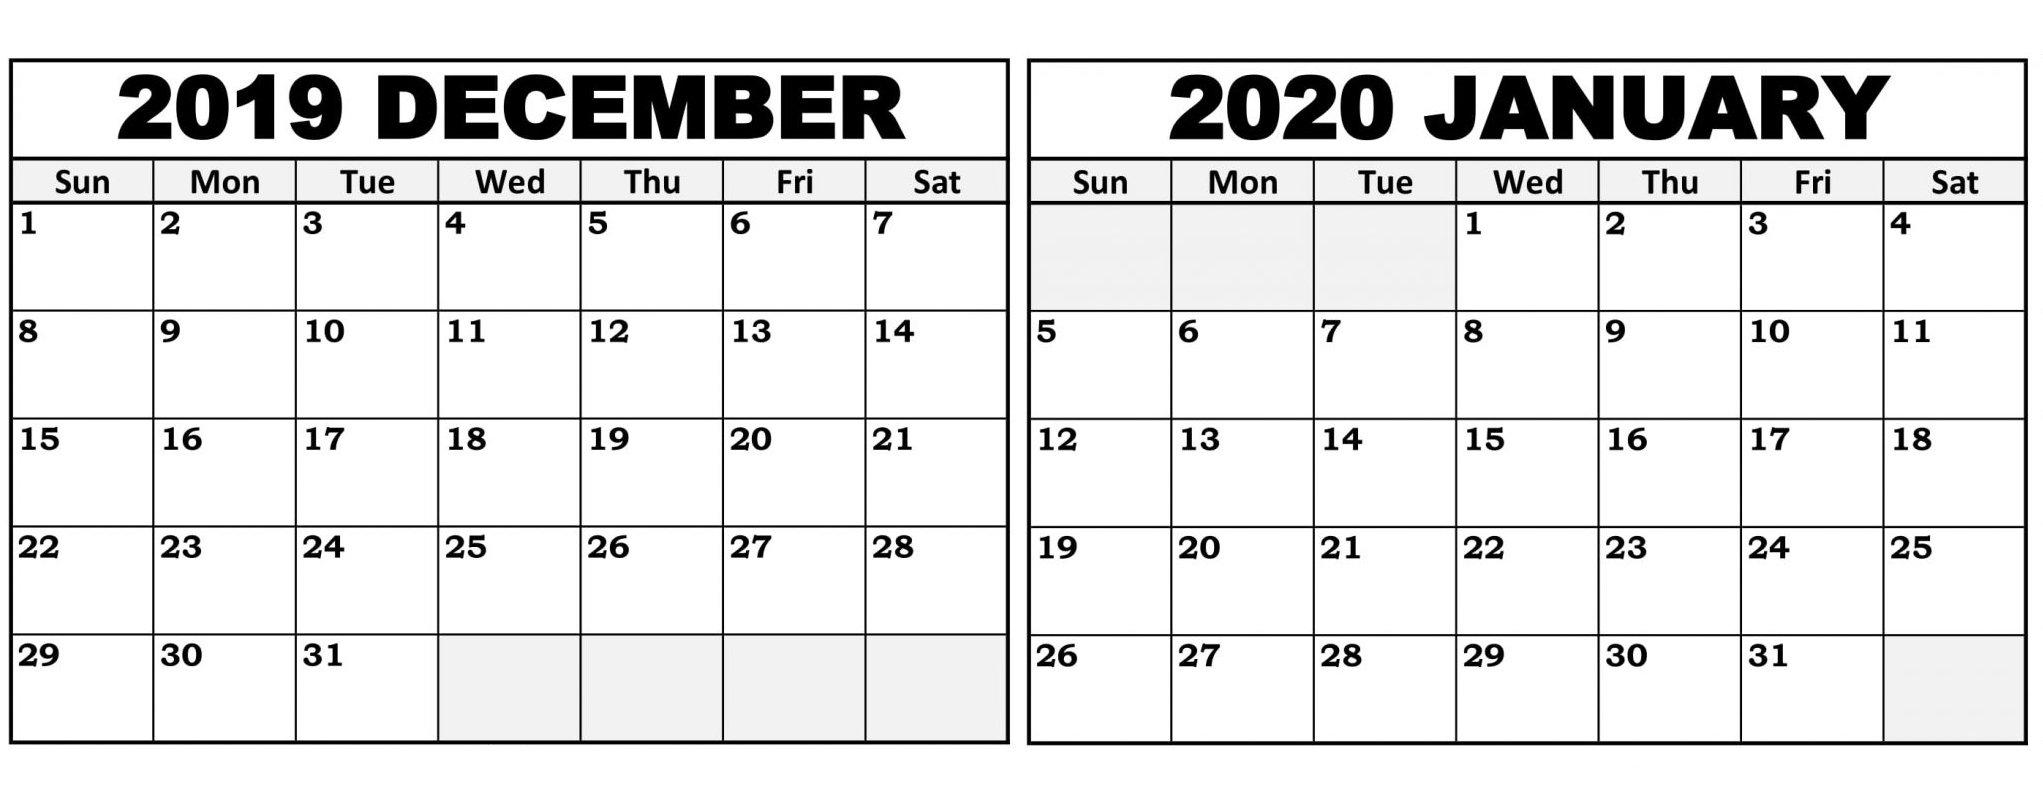 Print Calendar December 2020 And January 2020   Calendar within Free Printable December January Calendar Graphics